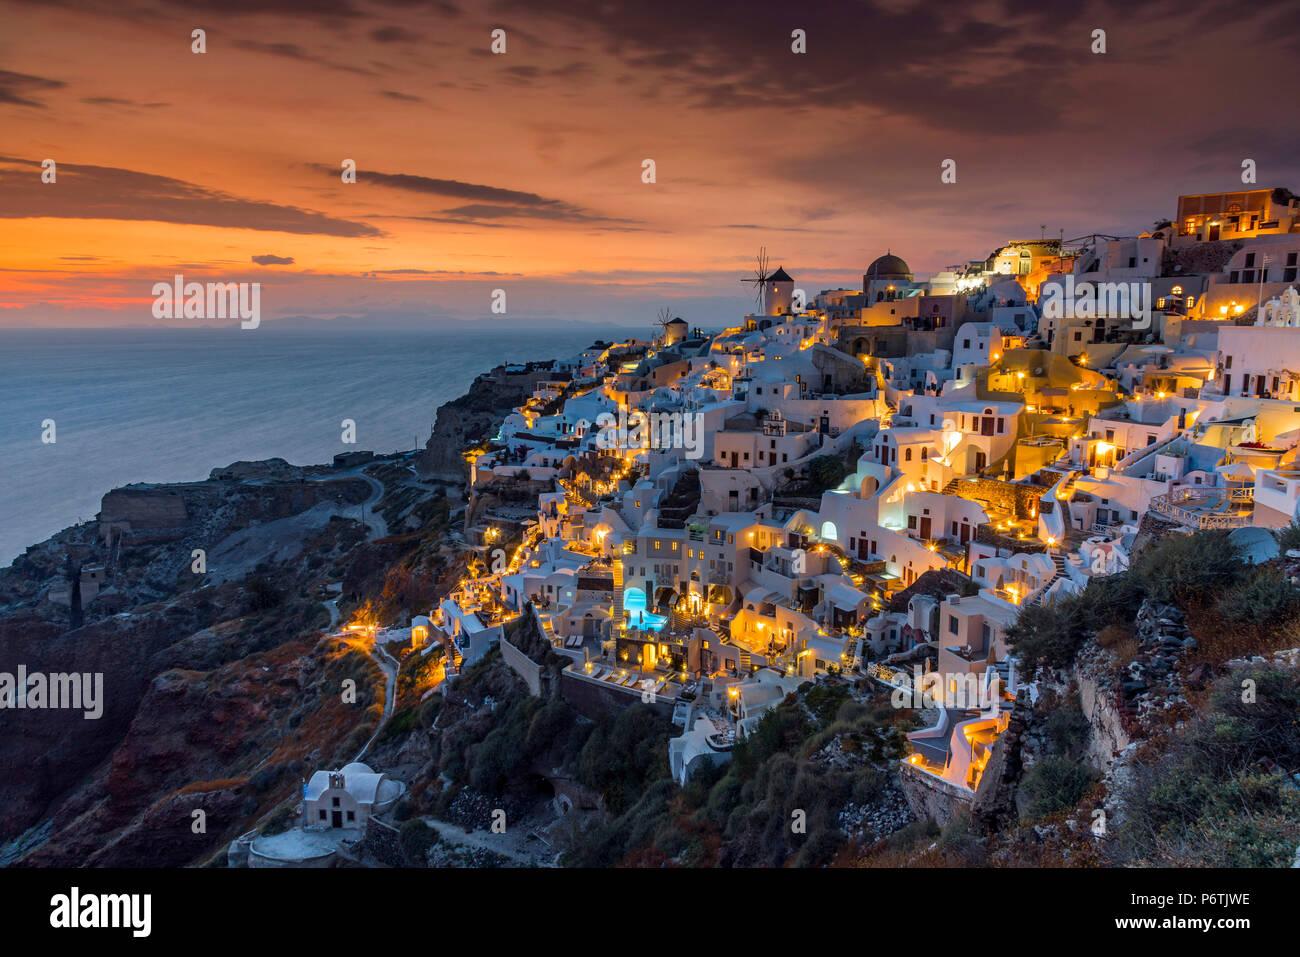 Sunset view, Oia, Santorini, South Aegean, Greece - Stock Image